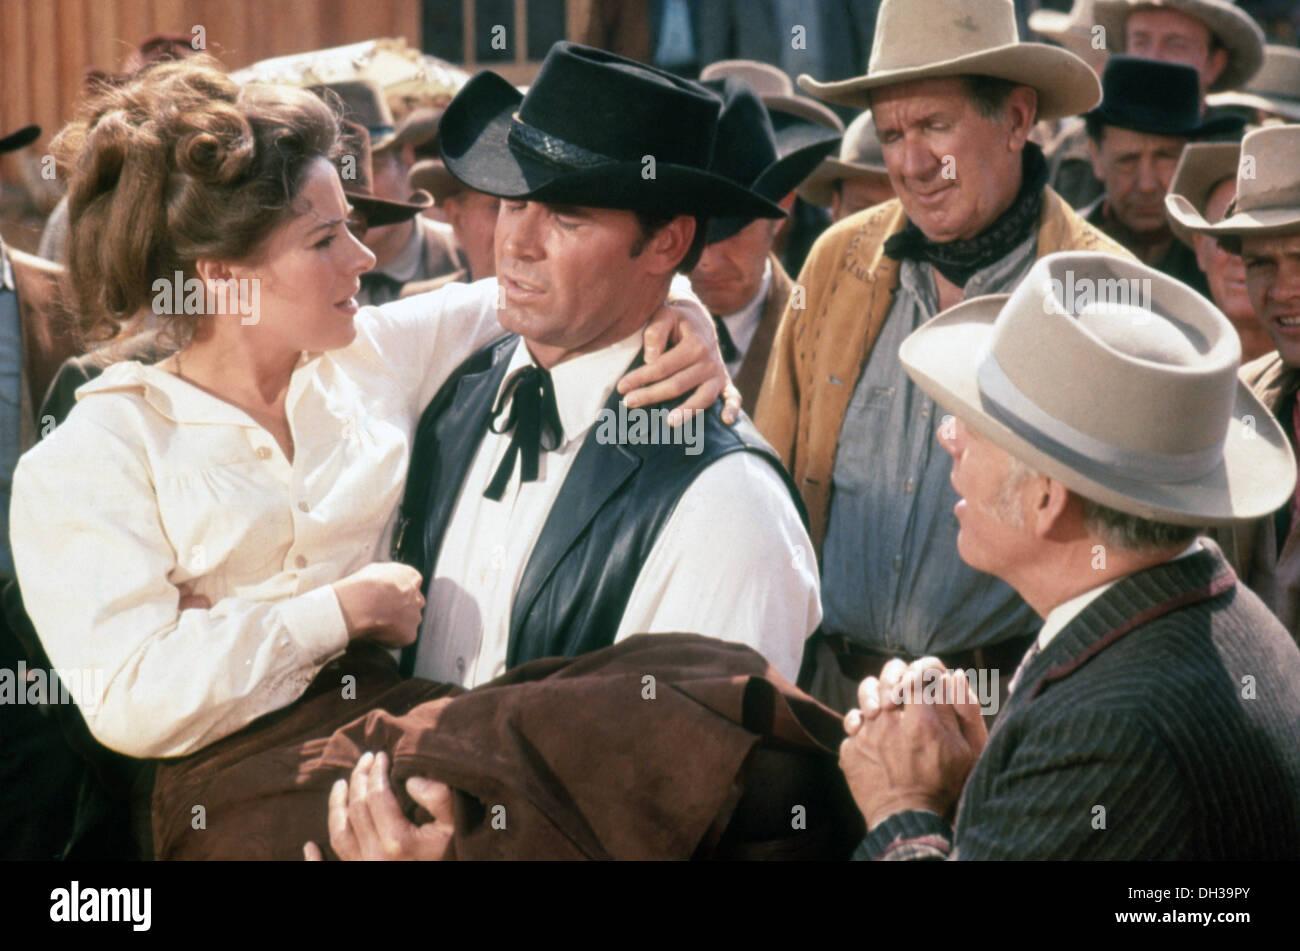 SUPPORT YOUR LOCAL SHERIFF 1969) JAMES GARNER, JOAN HACKETT, BURT KENNEDY DIR) SYLS 001 MOVIESTORE COLLECTION LTD - Stock Image